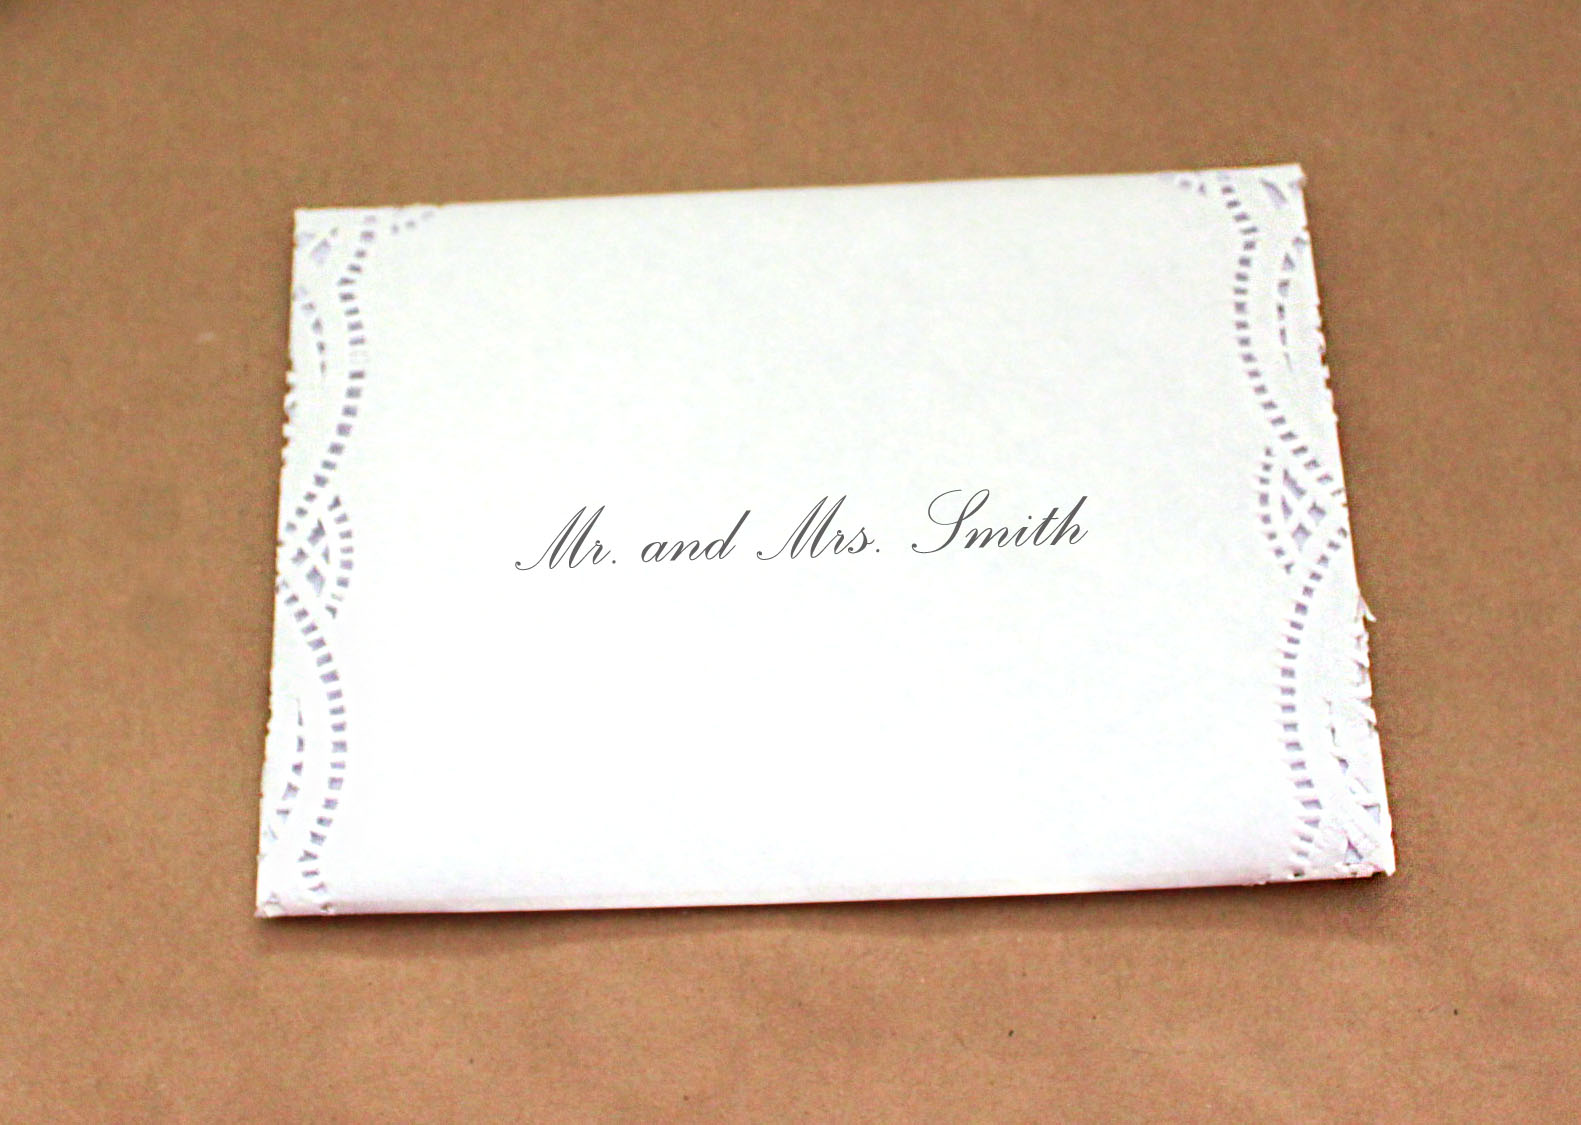 How To Write Wedding Invitation Envelopes | PaperInvite